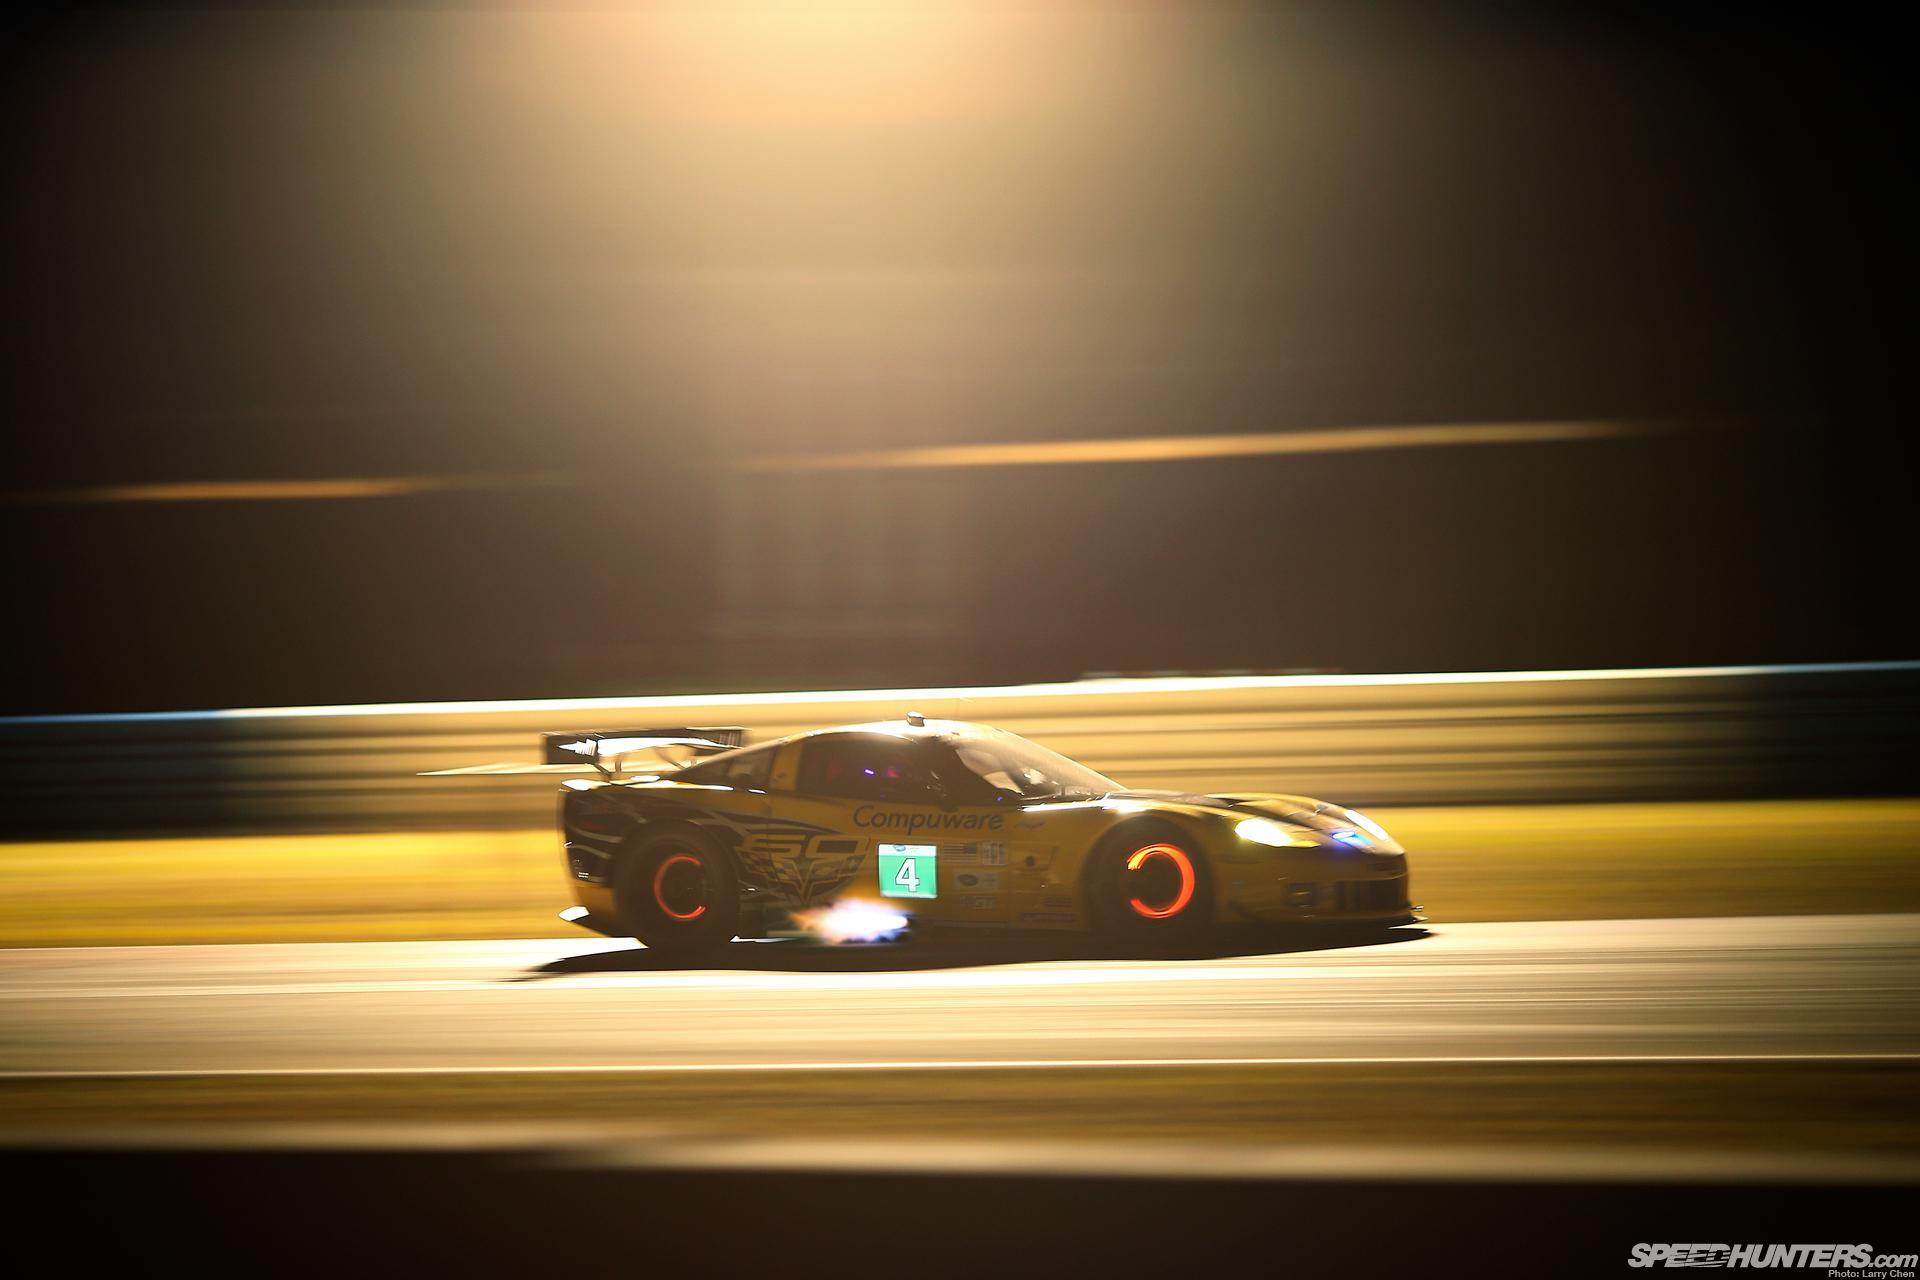 Corvette C6R Race Car Glowing Brakes Backfire Flame Night racing 1920x1280